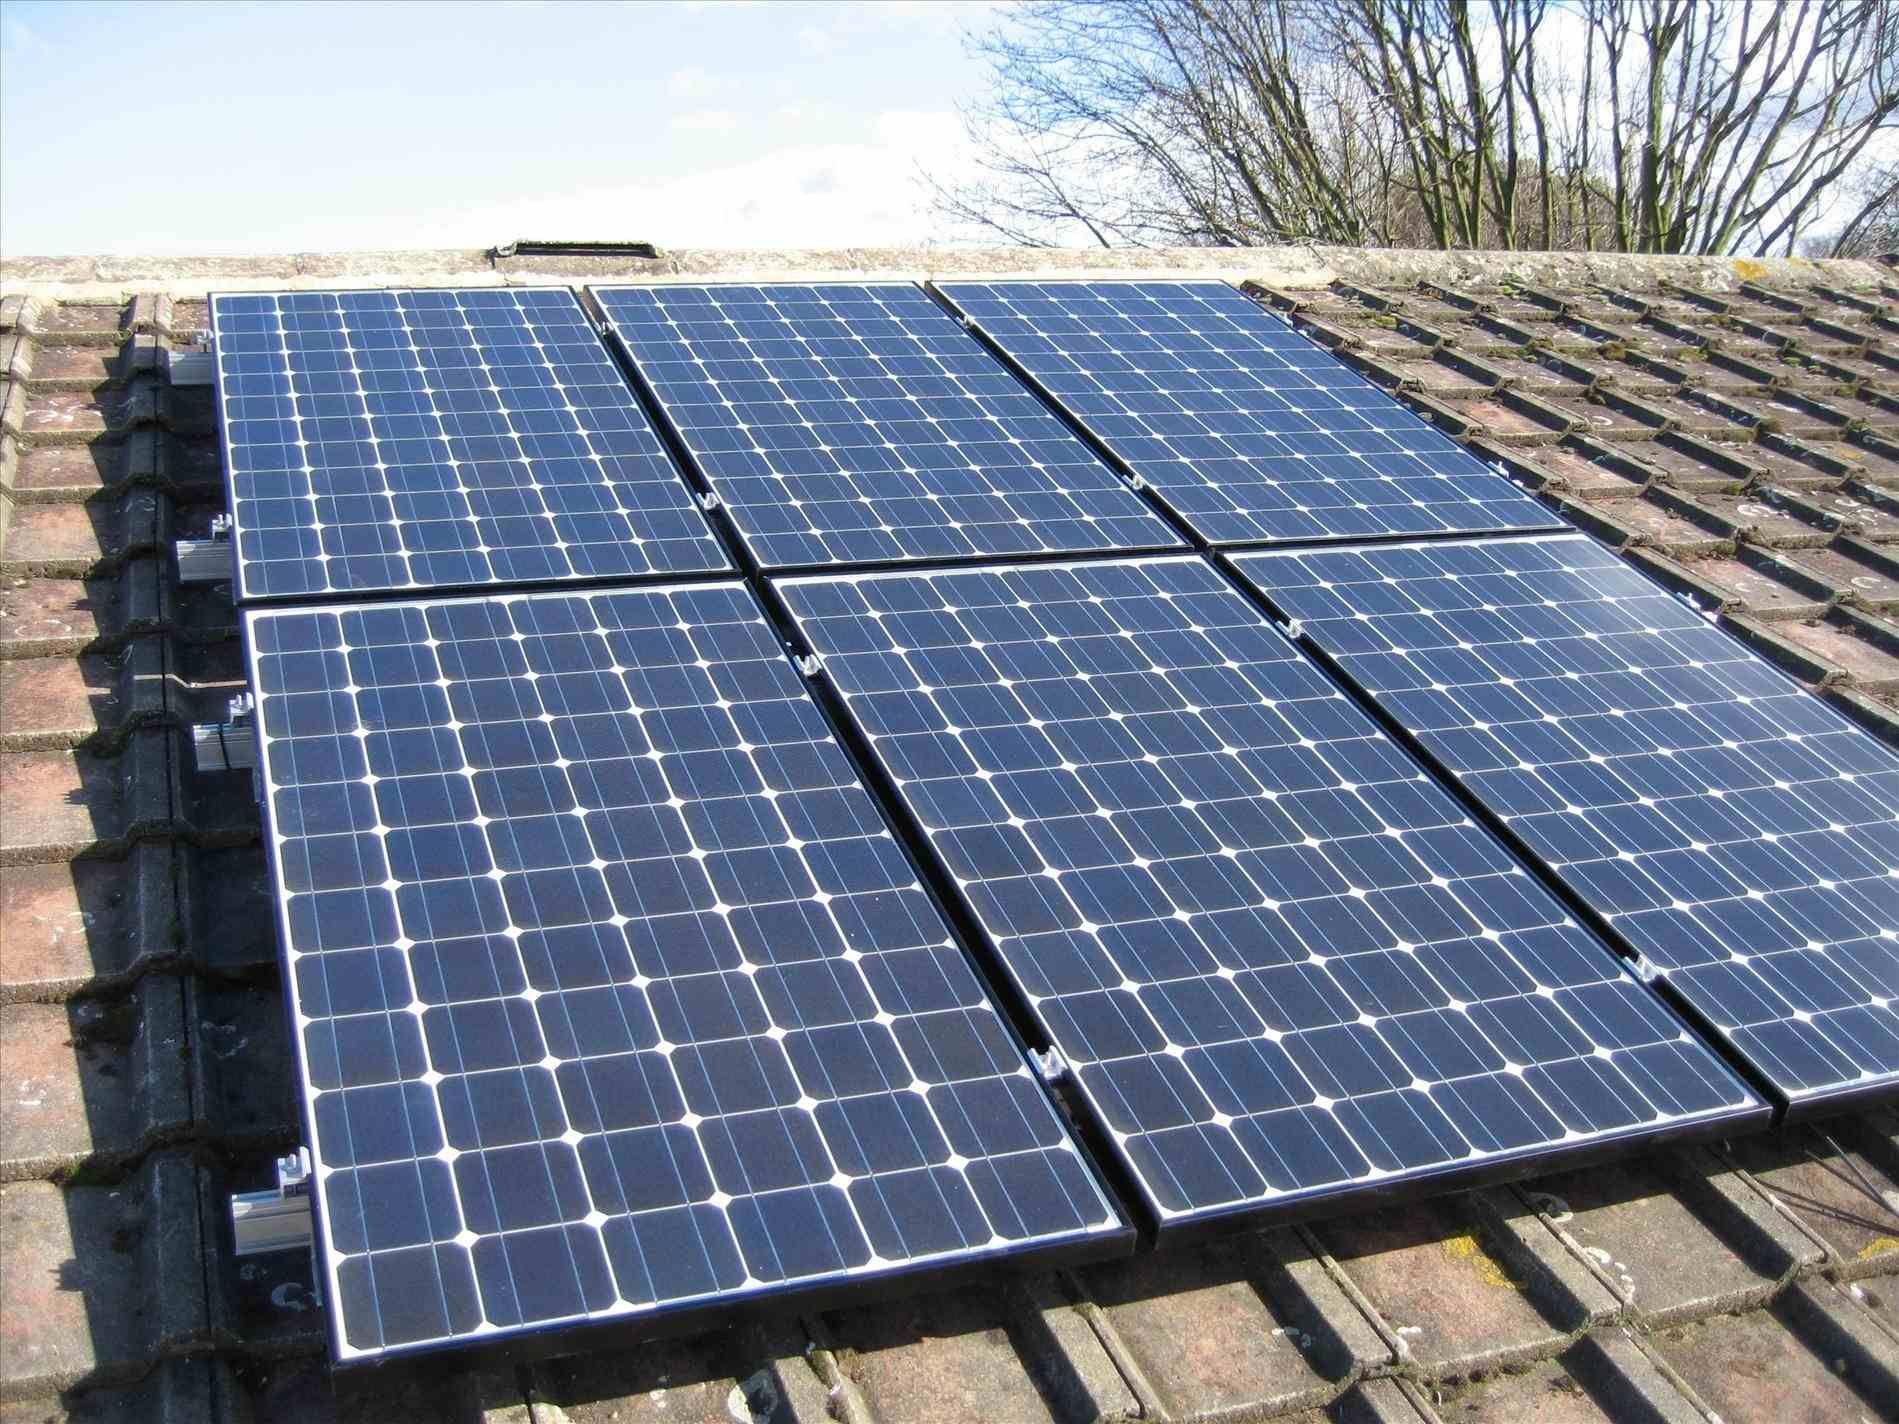 Roofing Garden Panels Free solar panels, Solar panels, Solar